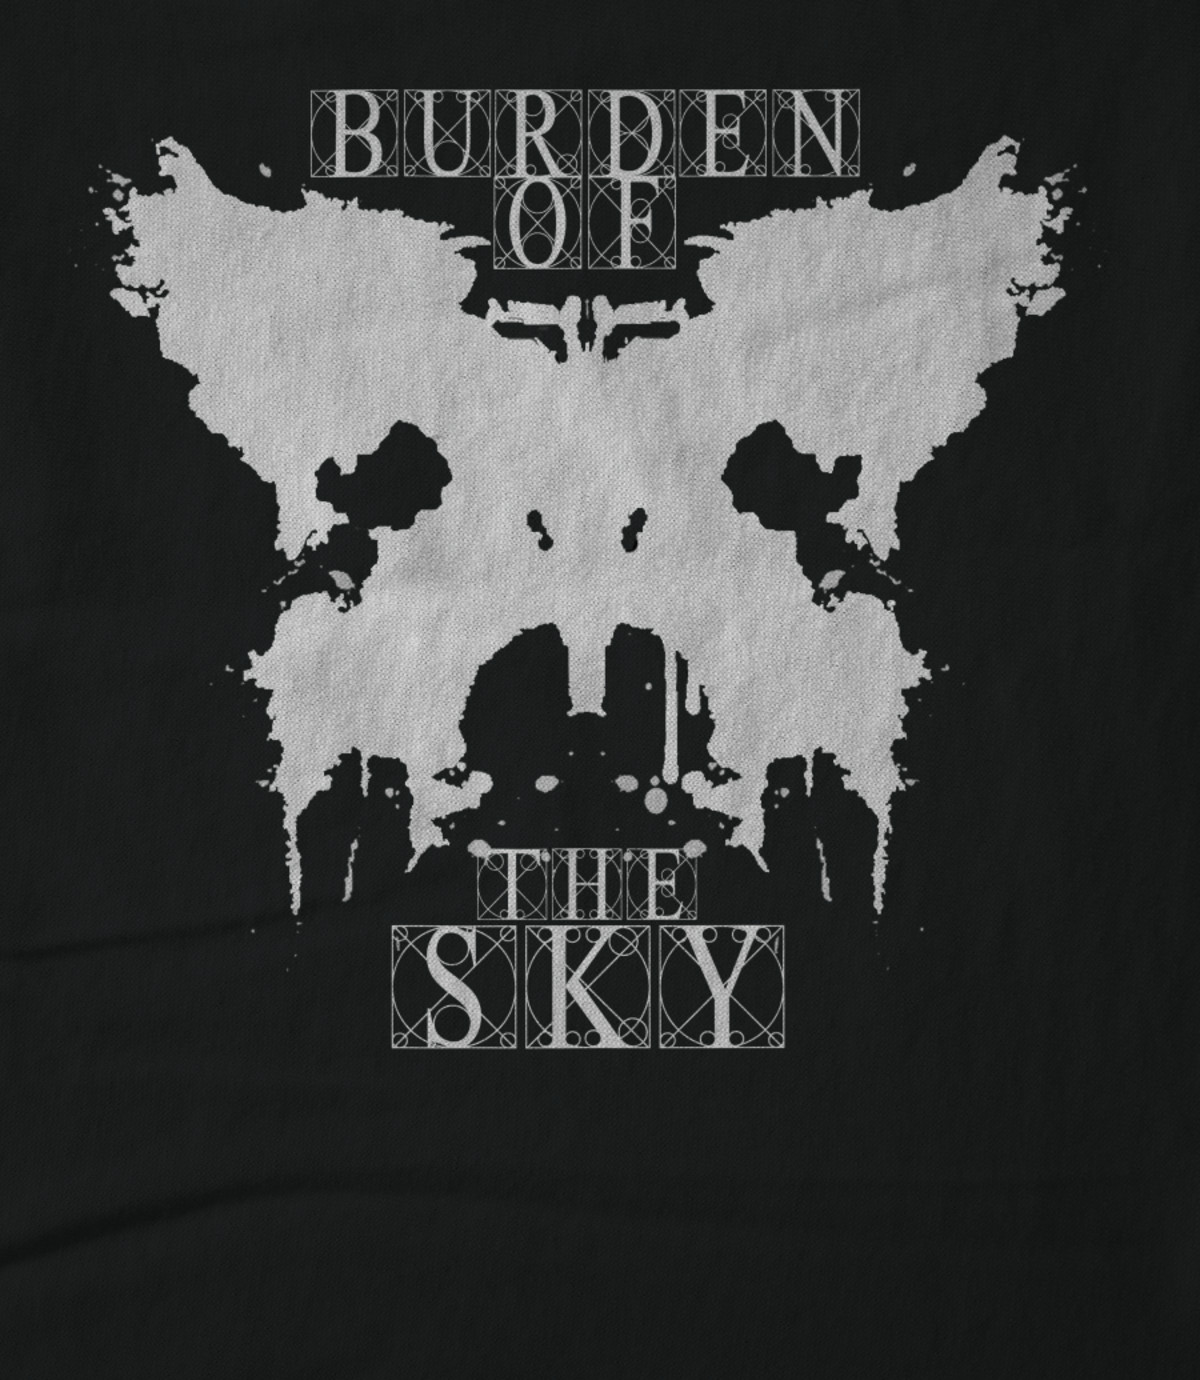 Burden of the sky rorschach  alt2  1496188975